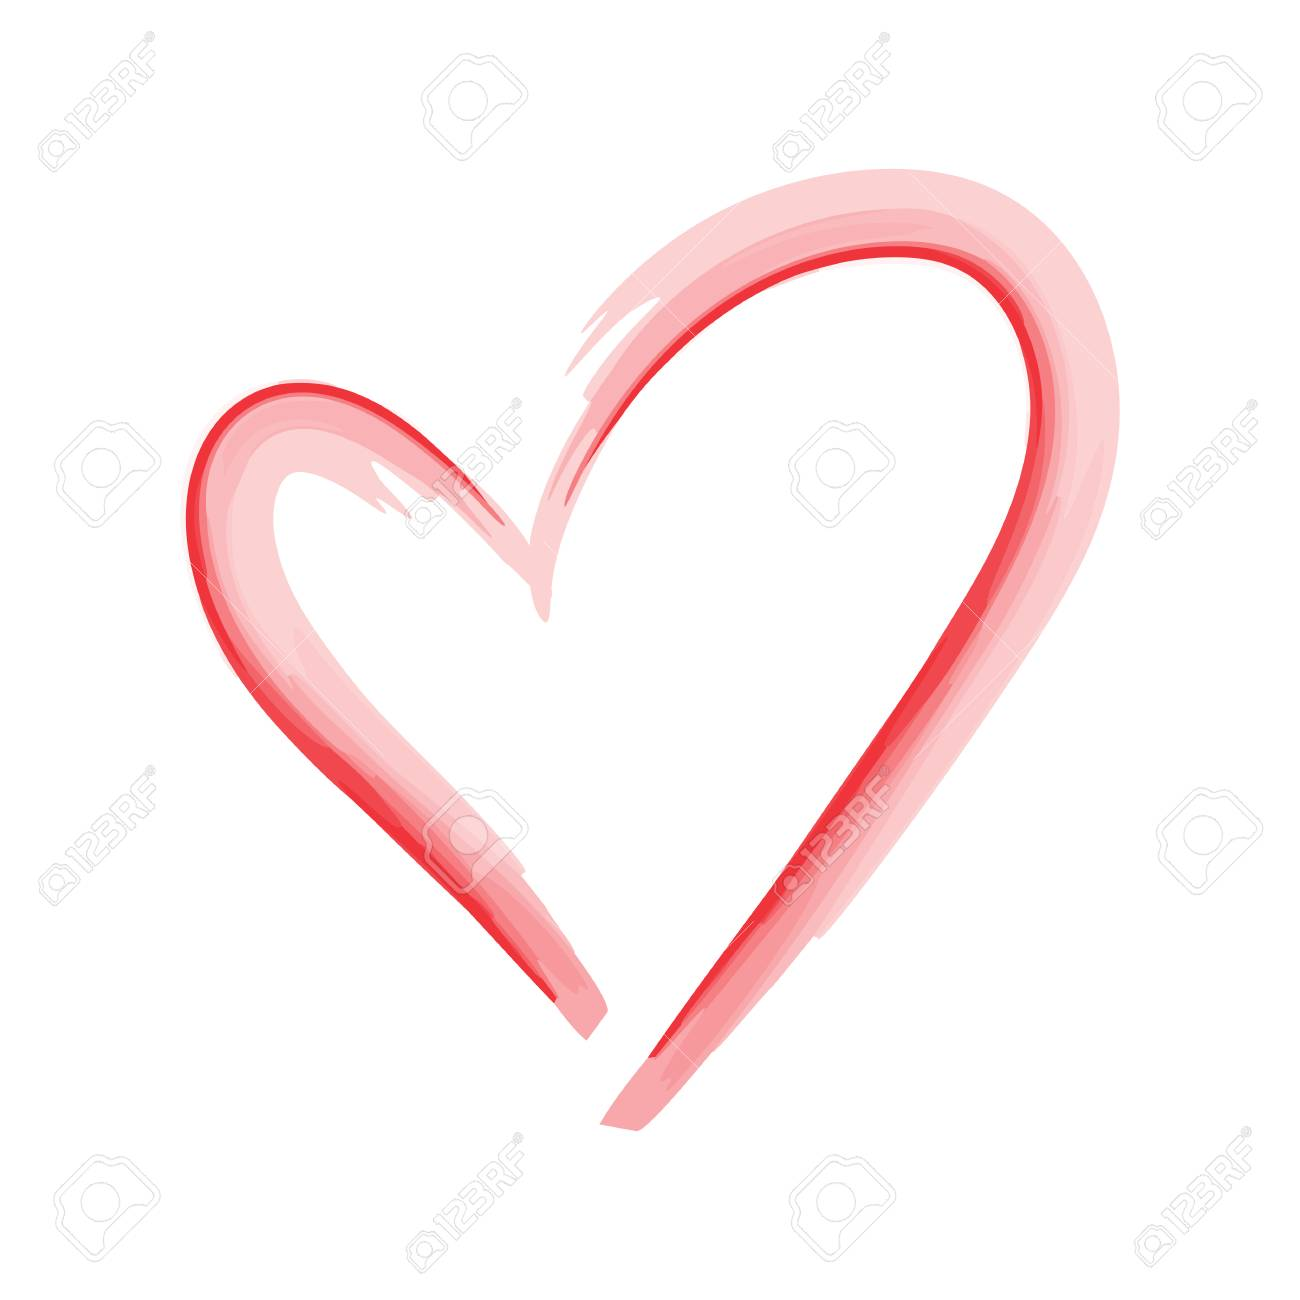 Heart shape design for love symbols valentines day royalty free heart shape design for love symbols valentines day stock vector 70462425 buycottarizona Gallery